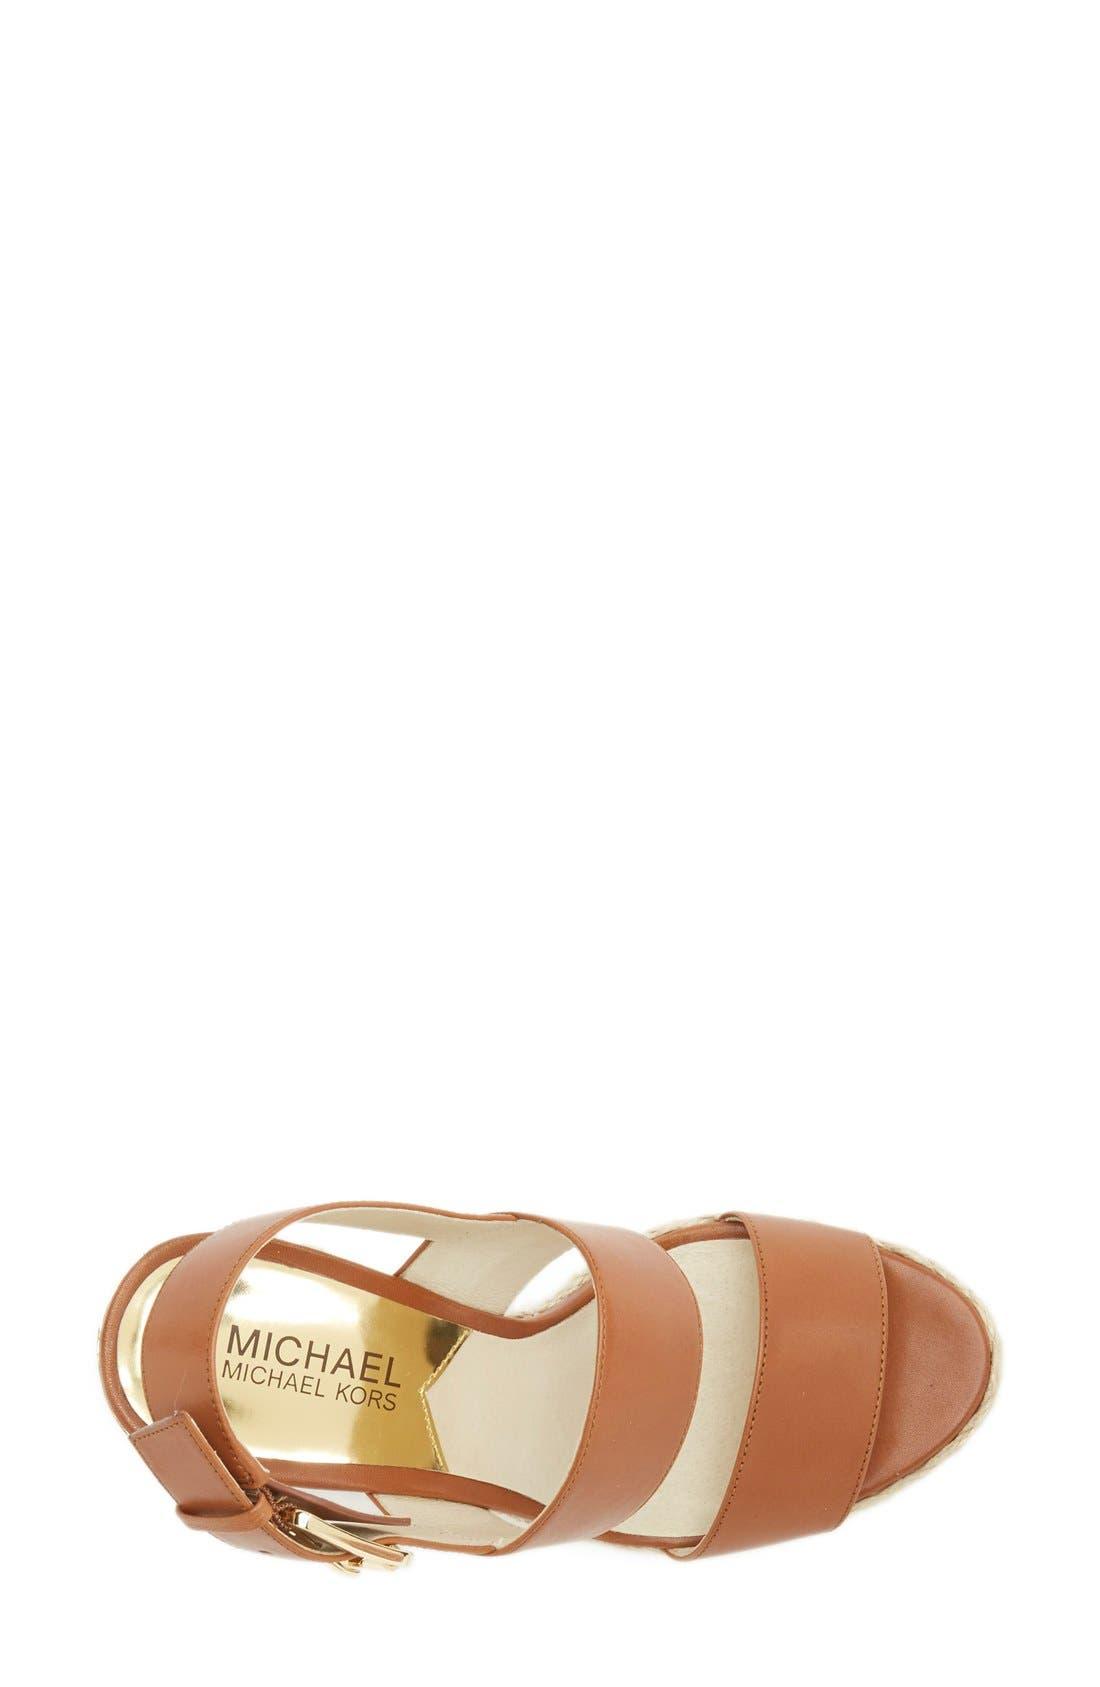 Alternate Image 3  - MICHAEL Michael Kors 'Posey' Espadrille Wedge Sandal (Women)